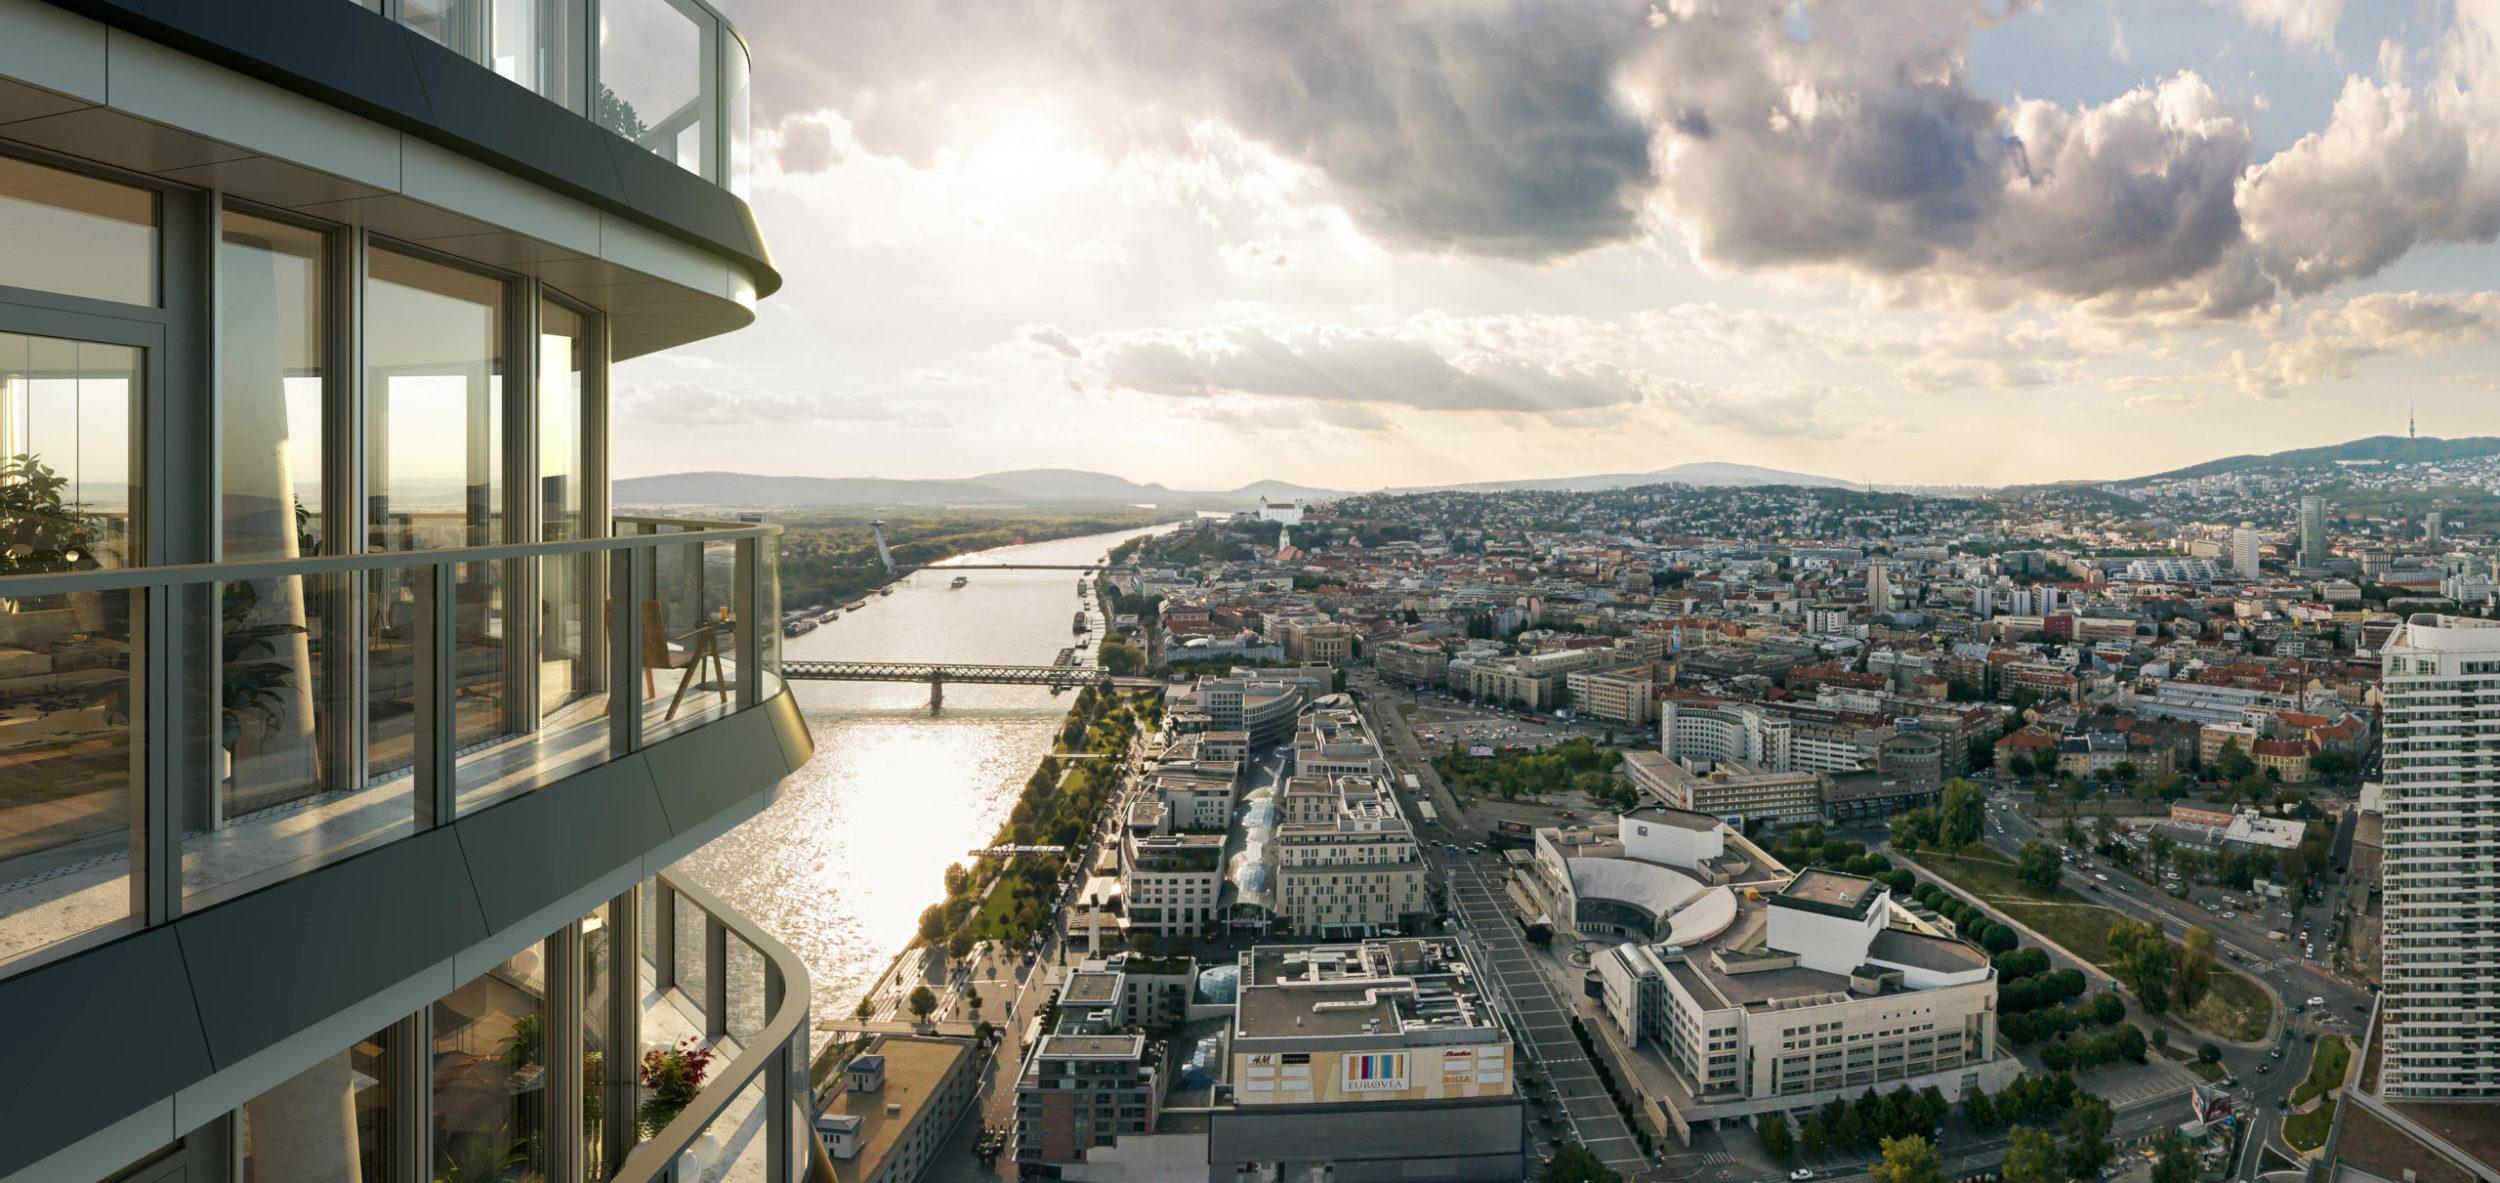 eurovea tower jtre